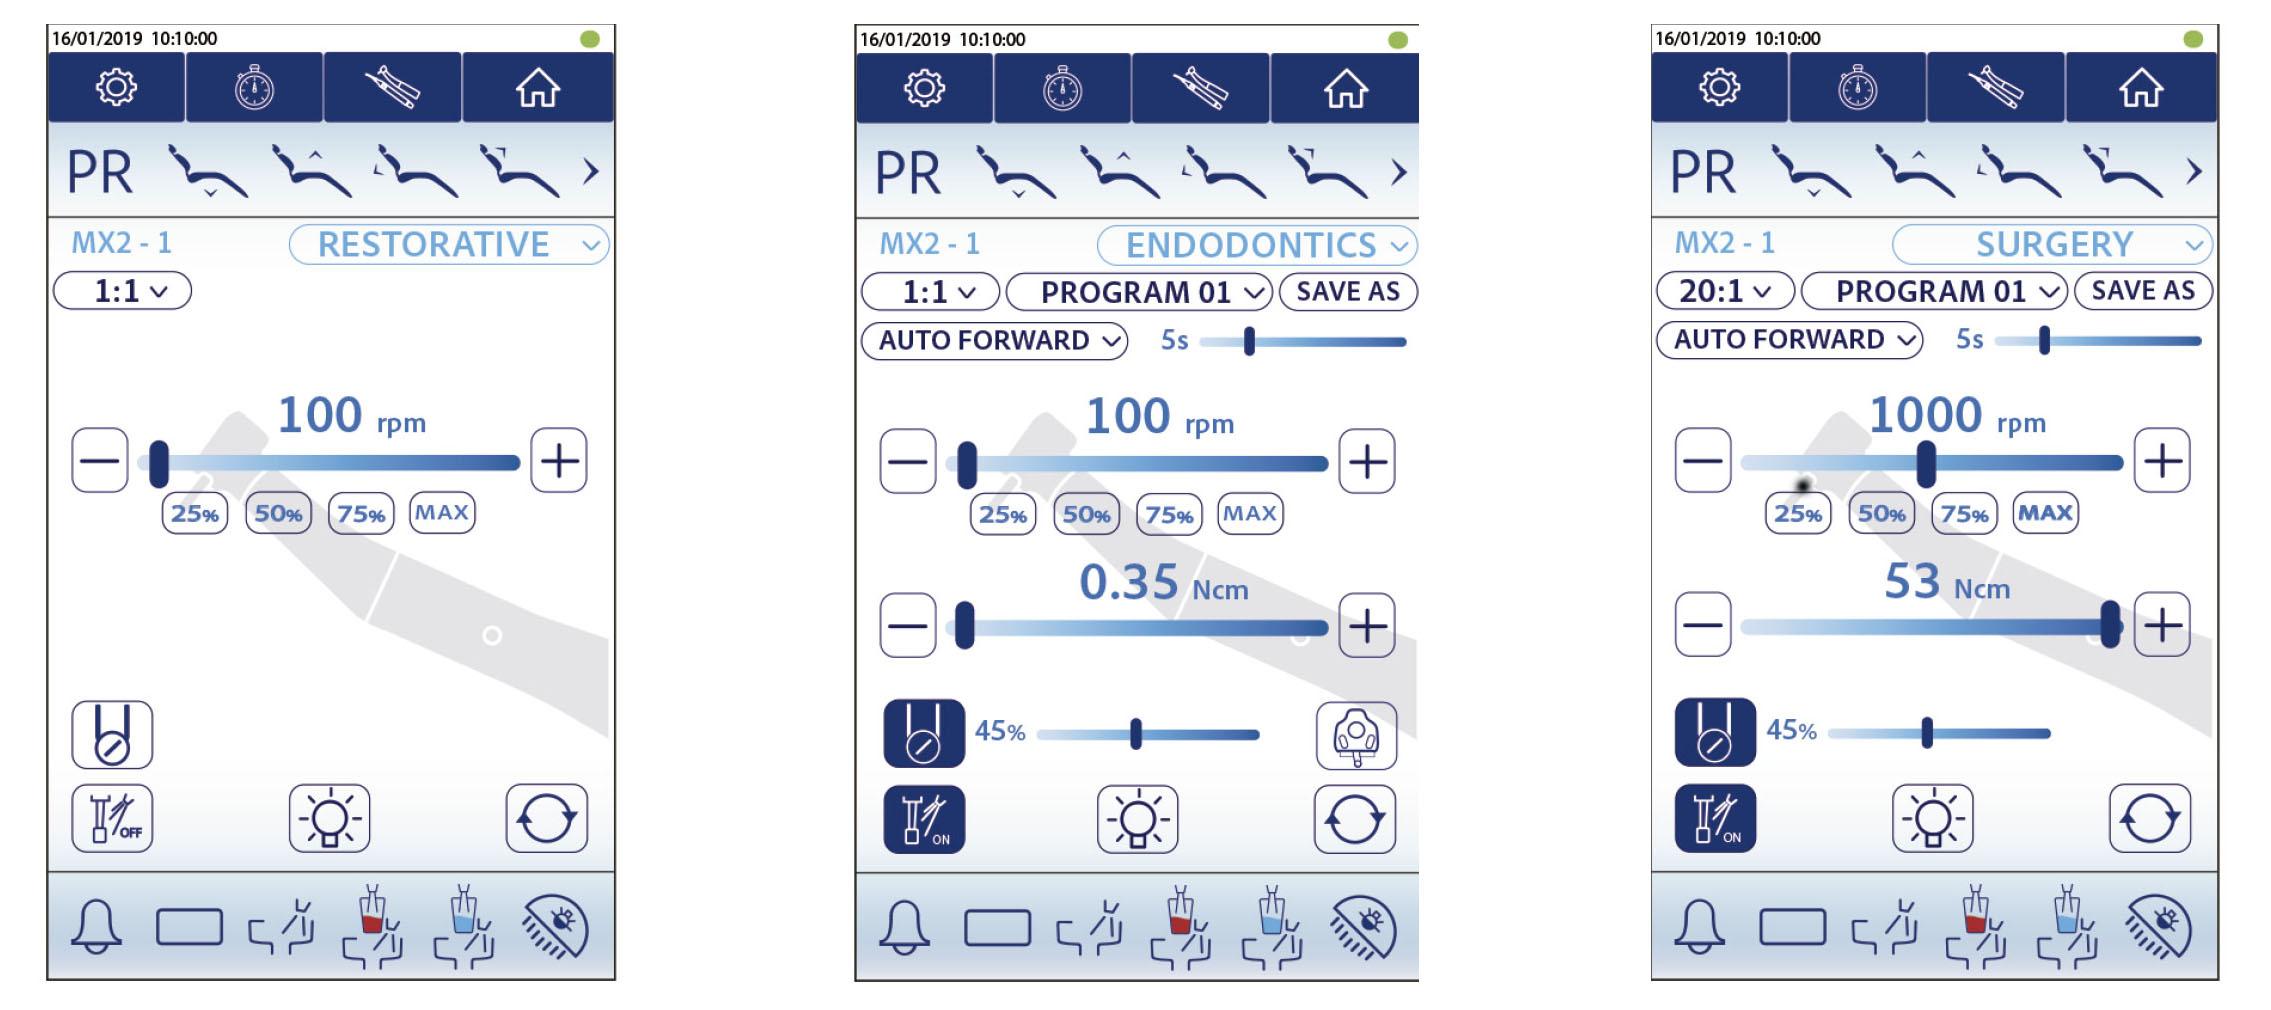 Pantalla Digital Ajustes Micro-motor MX2 Miglionico Nice Touch